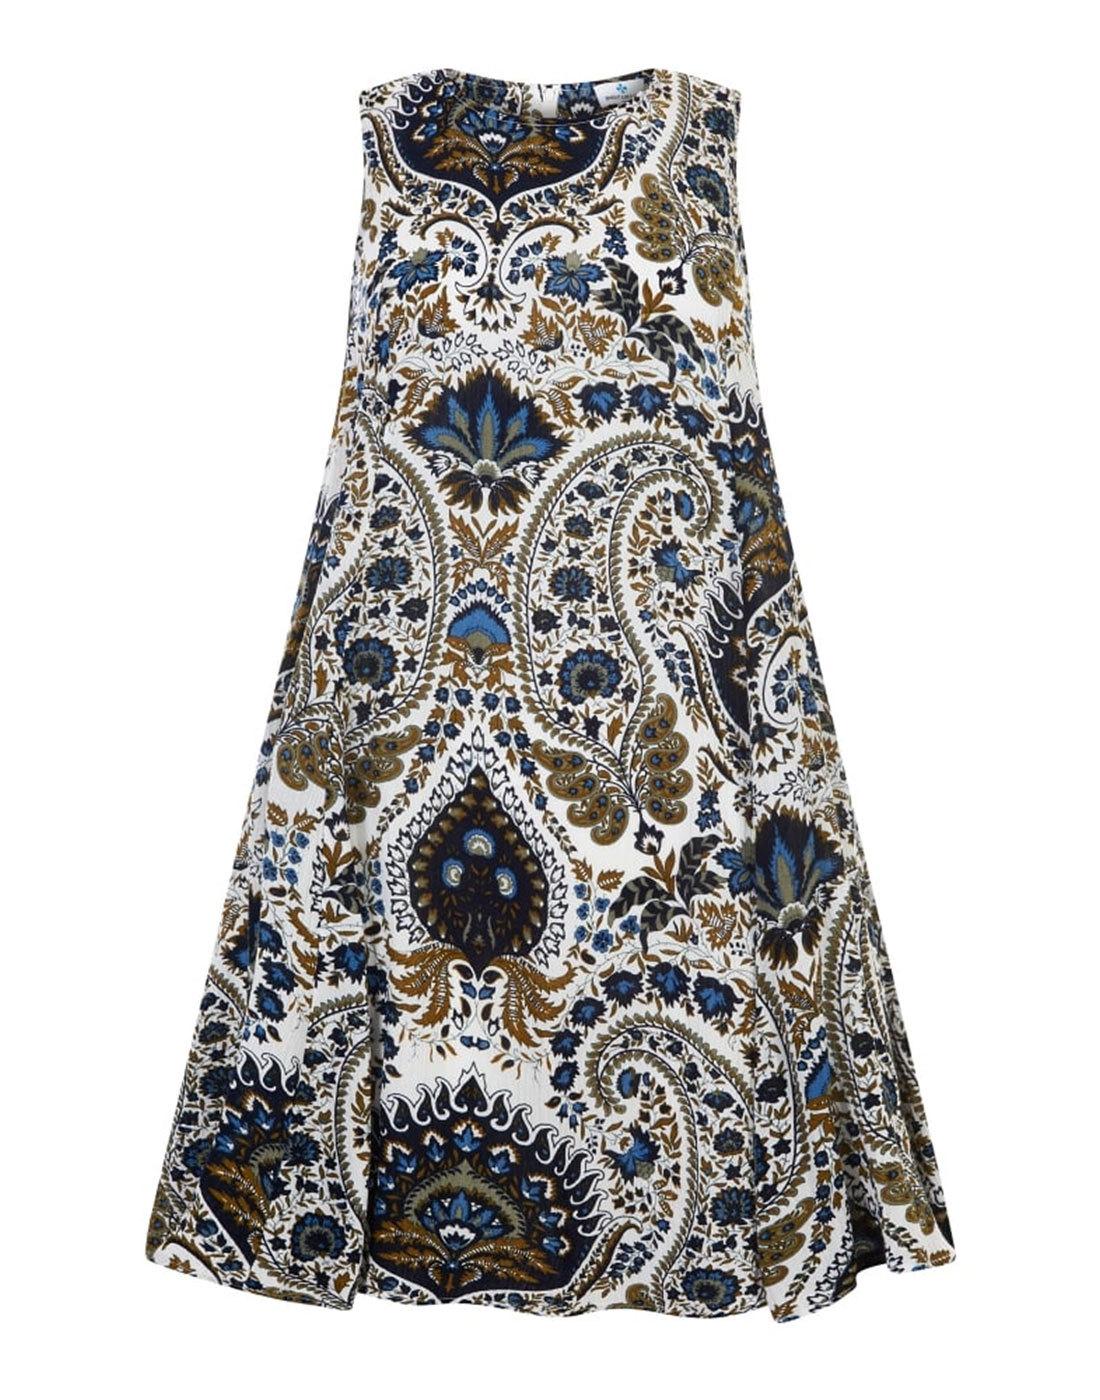 Tessa BRIGHT & BEAUTIFUL Baby Doll Paisley Dress